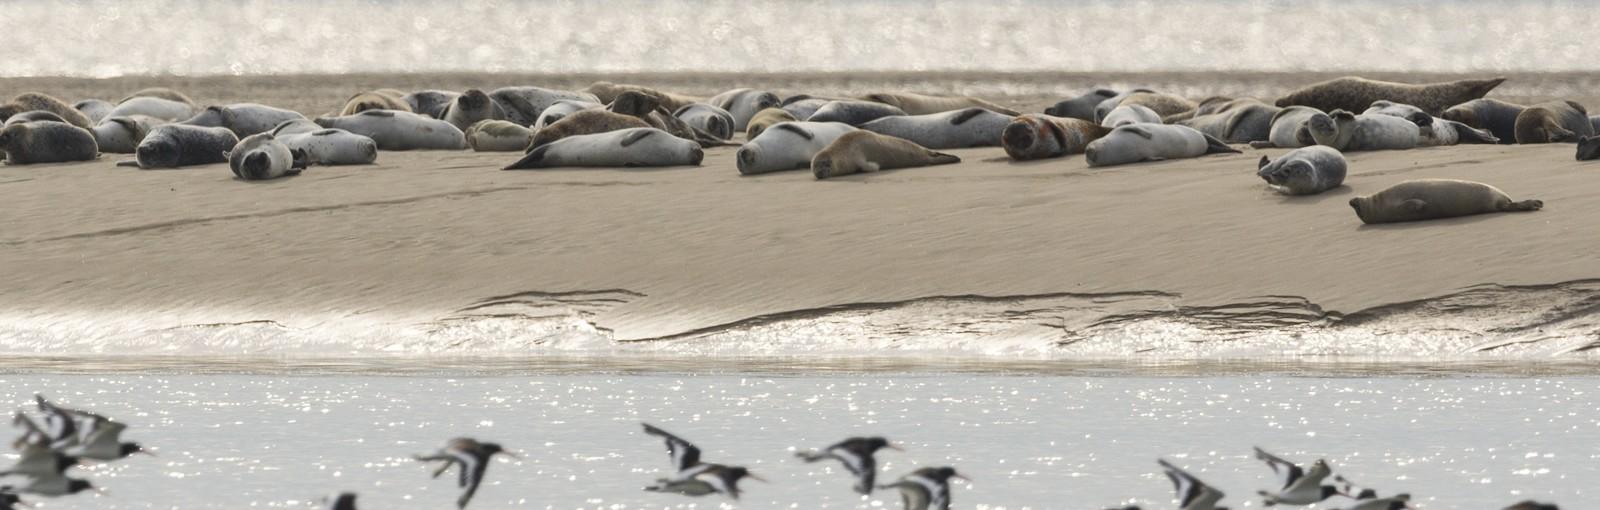 Bahía de Somme - focas